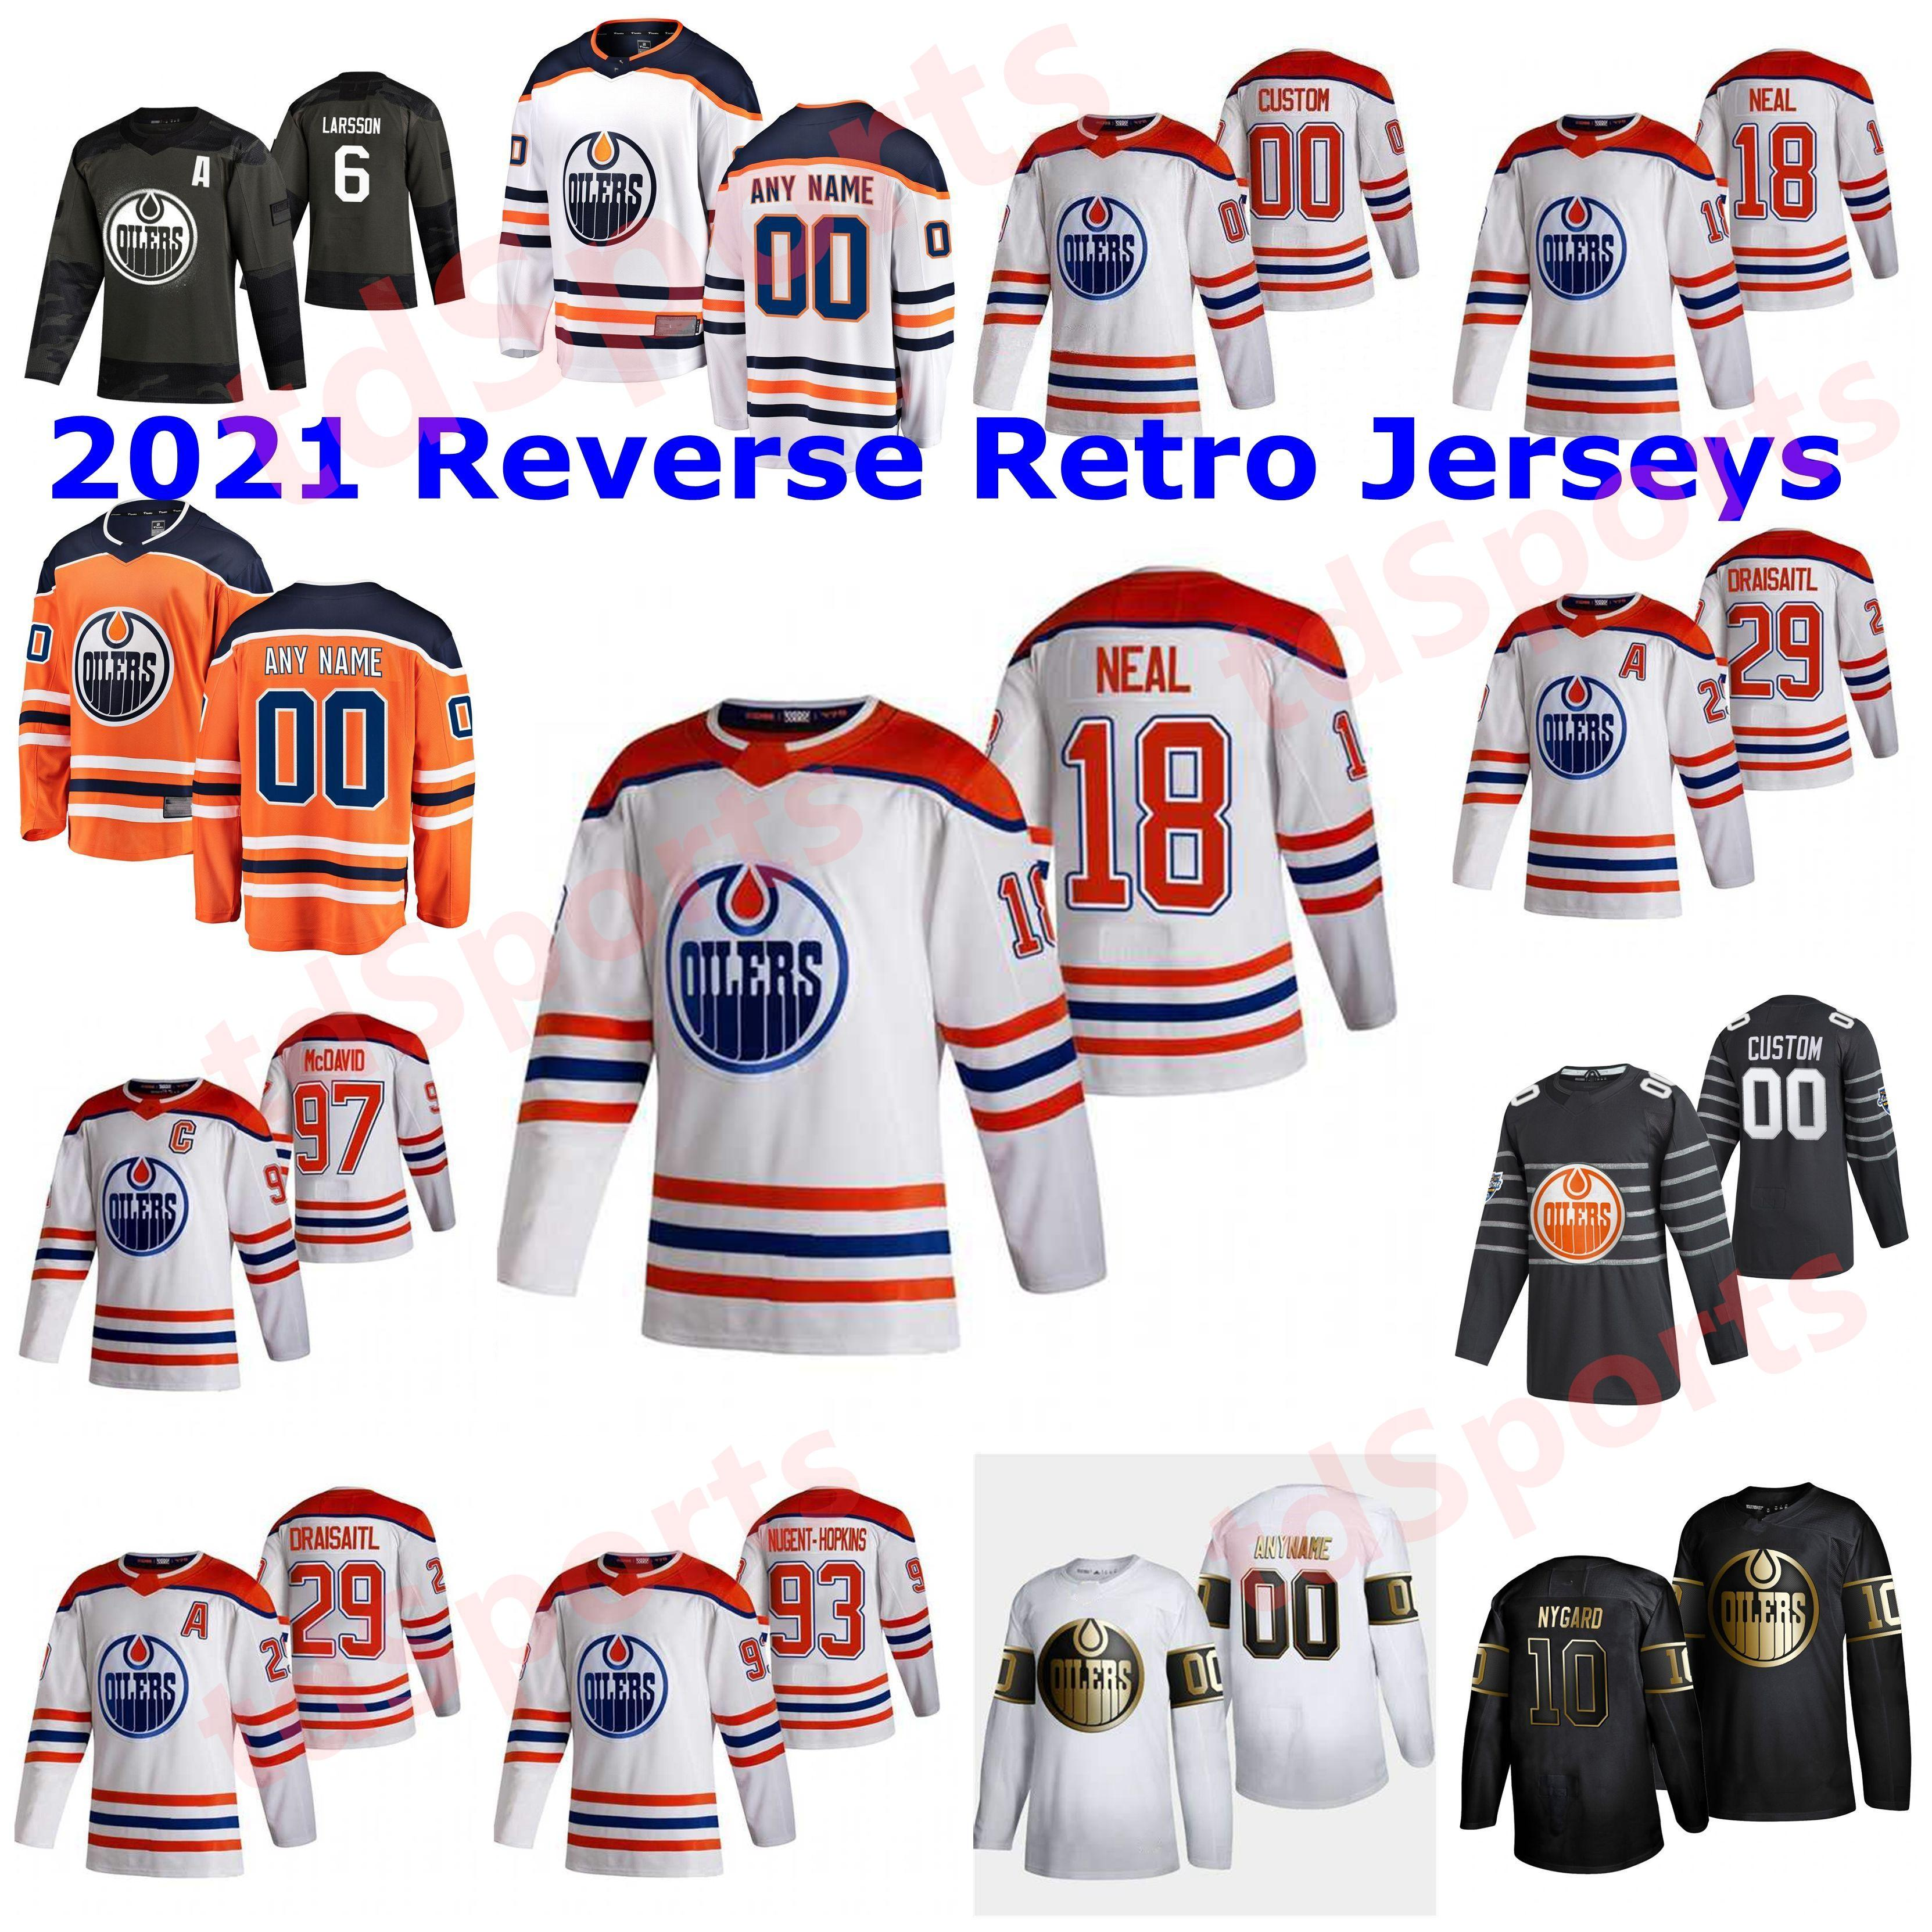 Edmonton Oilers 2021 Reverse Retro Hóquei Jerseys 26 Brandon Manning Jersey 36 Joel Persson 4 Kris Russell 19 Mikko Koskinen Costume Costume